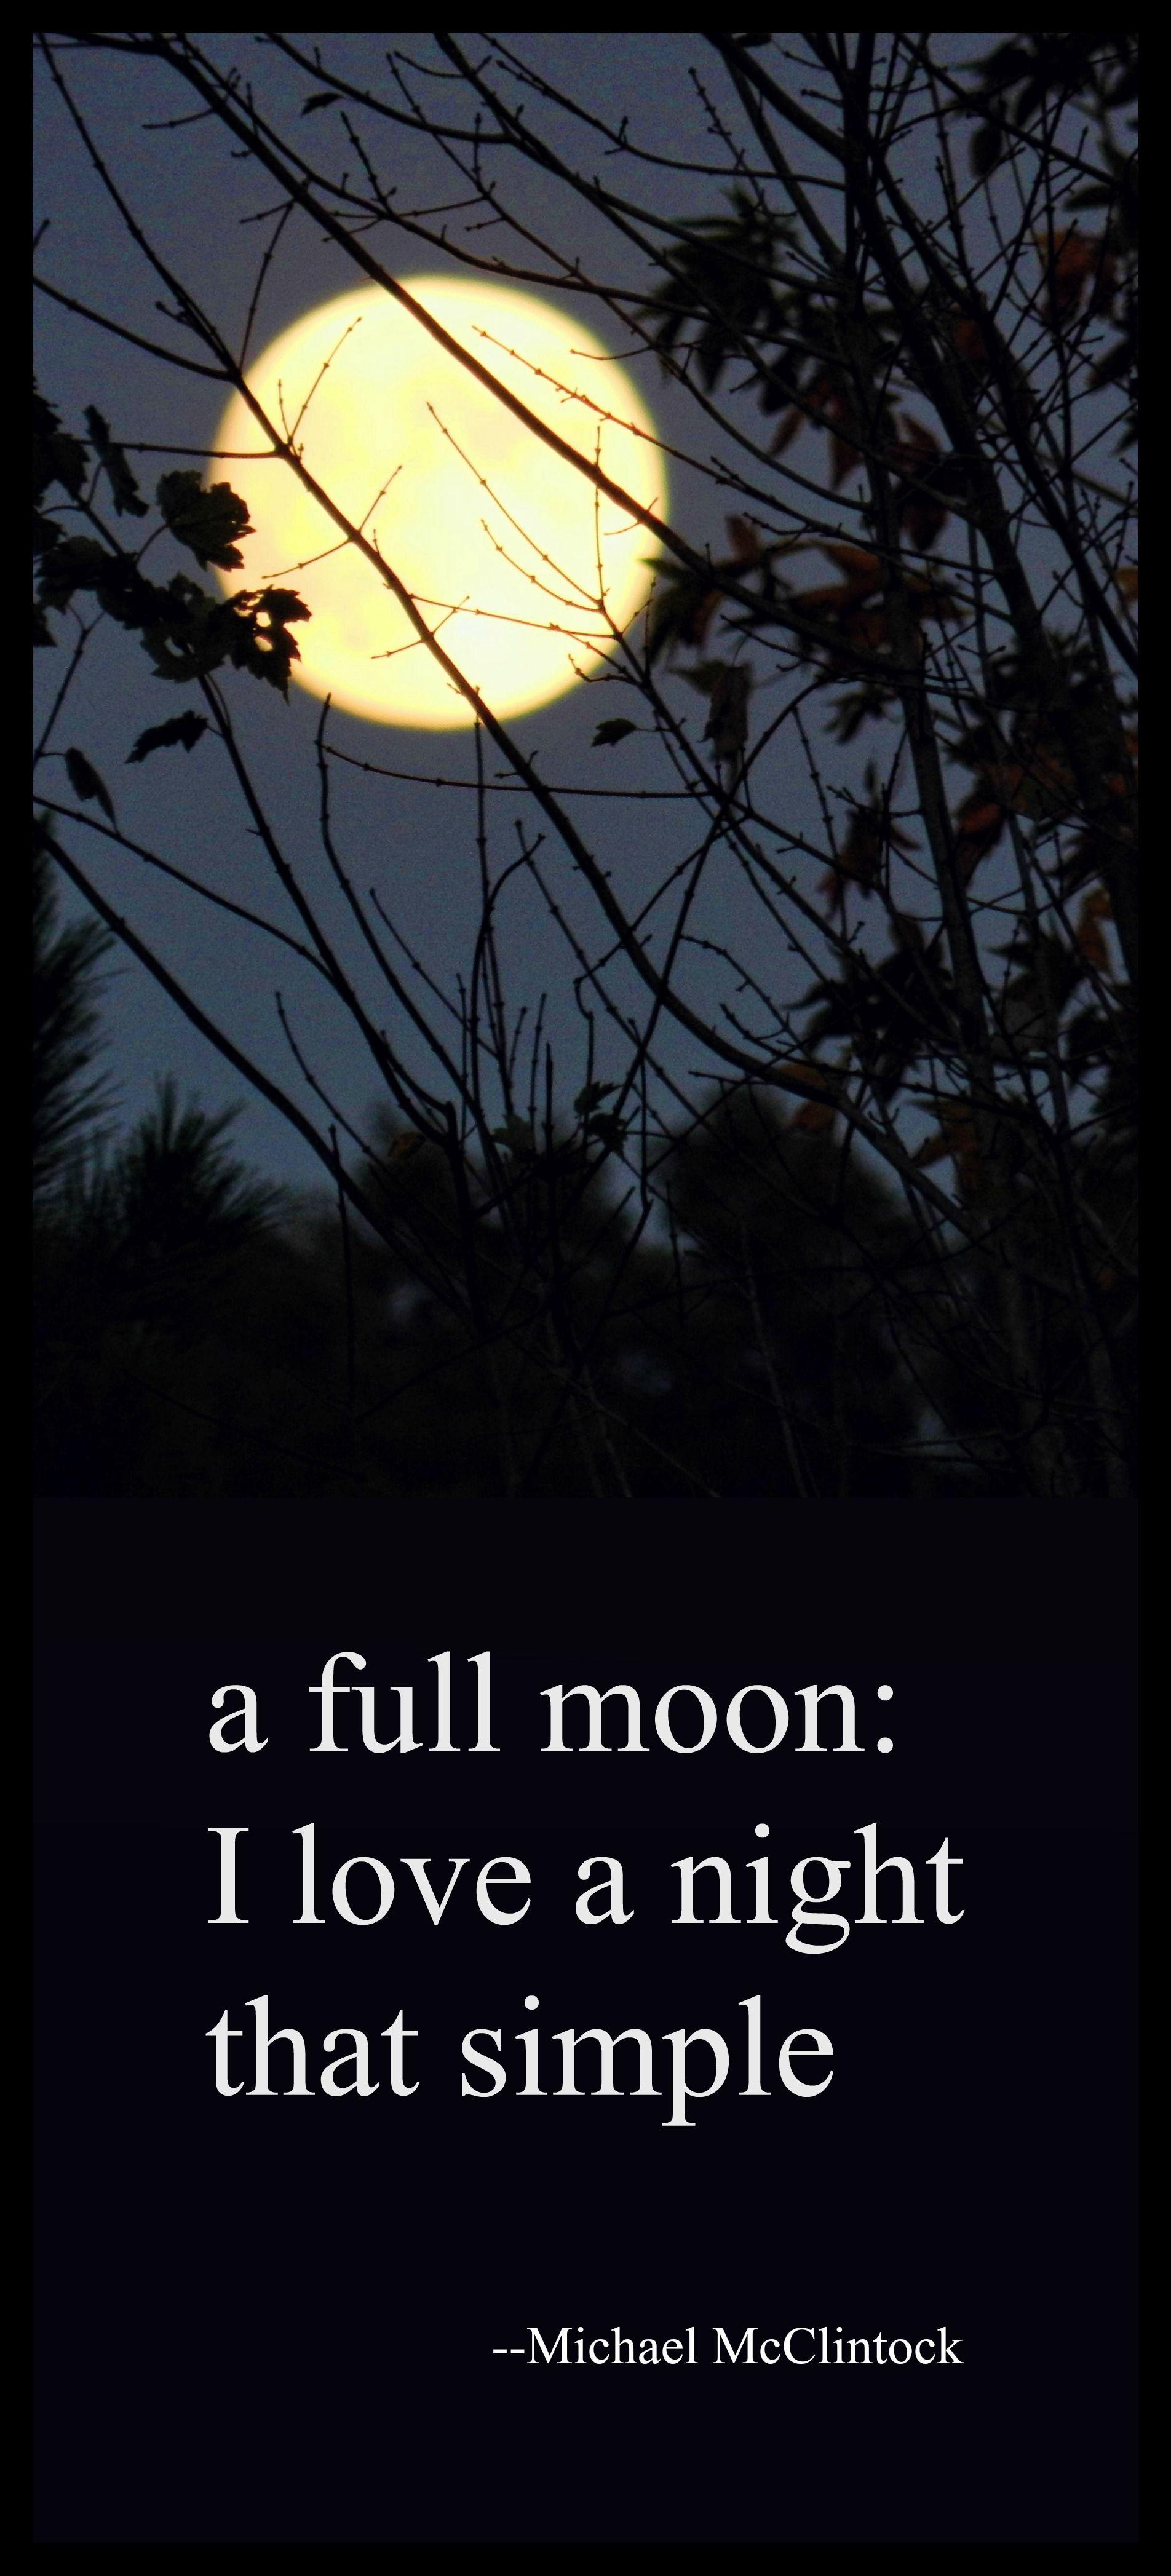 a full moon: I love a night that simple ༺♡༻ Haiku Poem by Michael McClintock